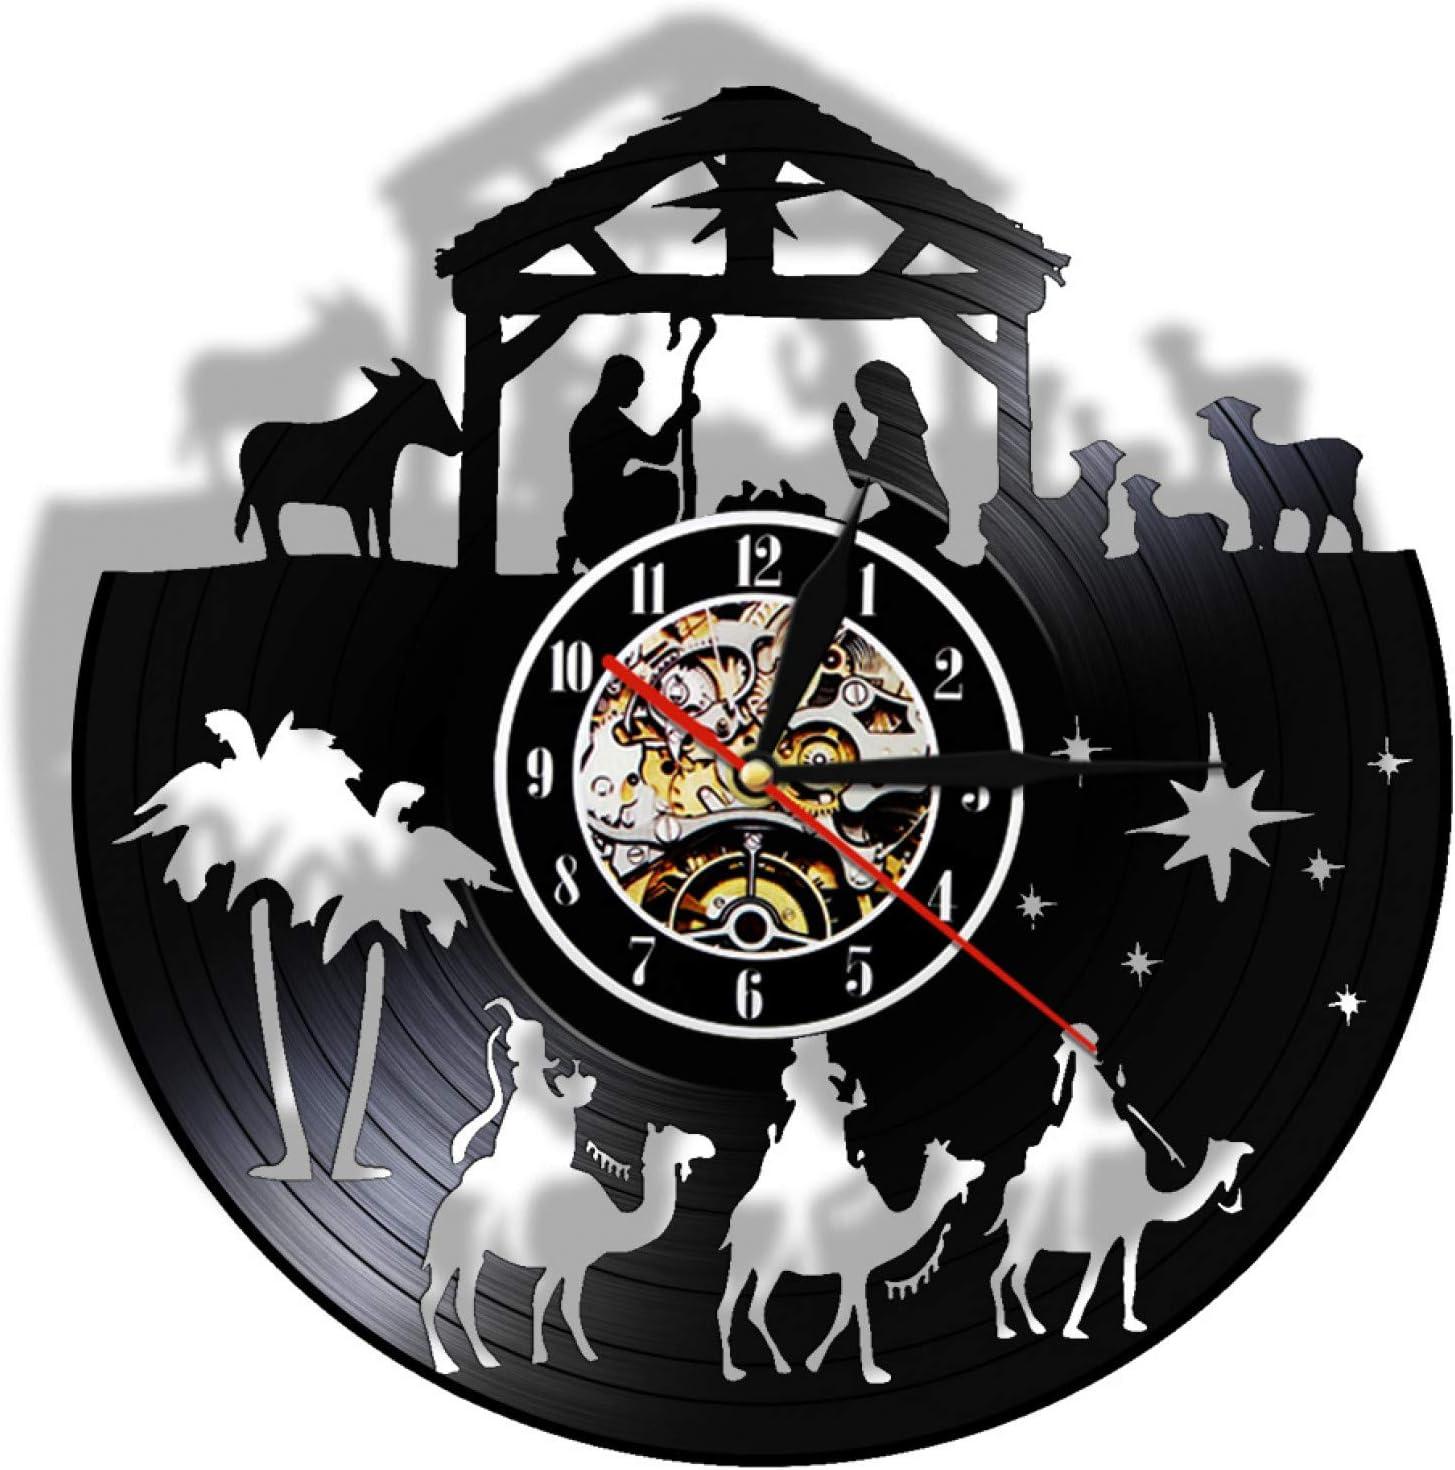 hhhjjj Jesús nació en el Pesebre Disco de Vinilo religioso Reloj de Pared Pesebre navideño Artista de Pared religioso decoración del hogar Reloj Cristiano